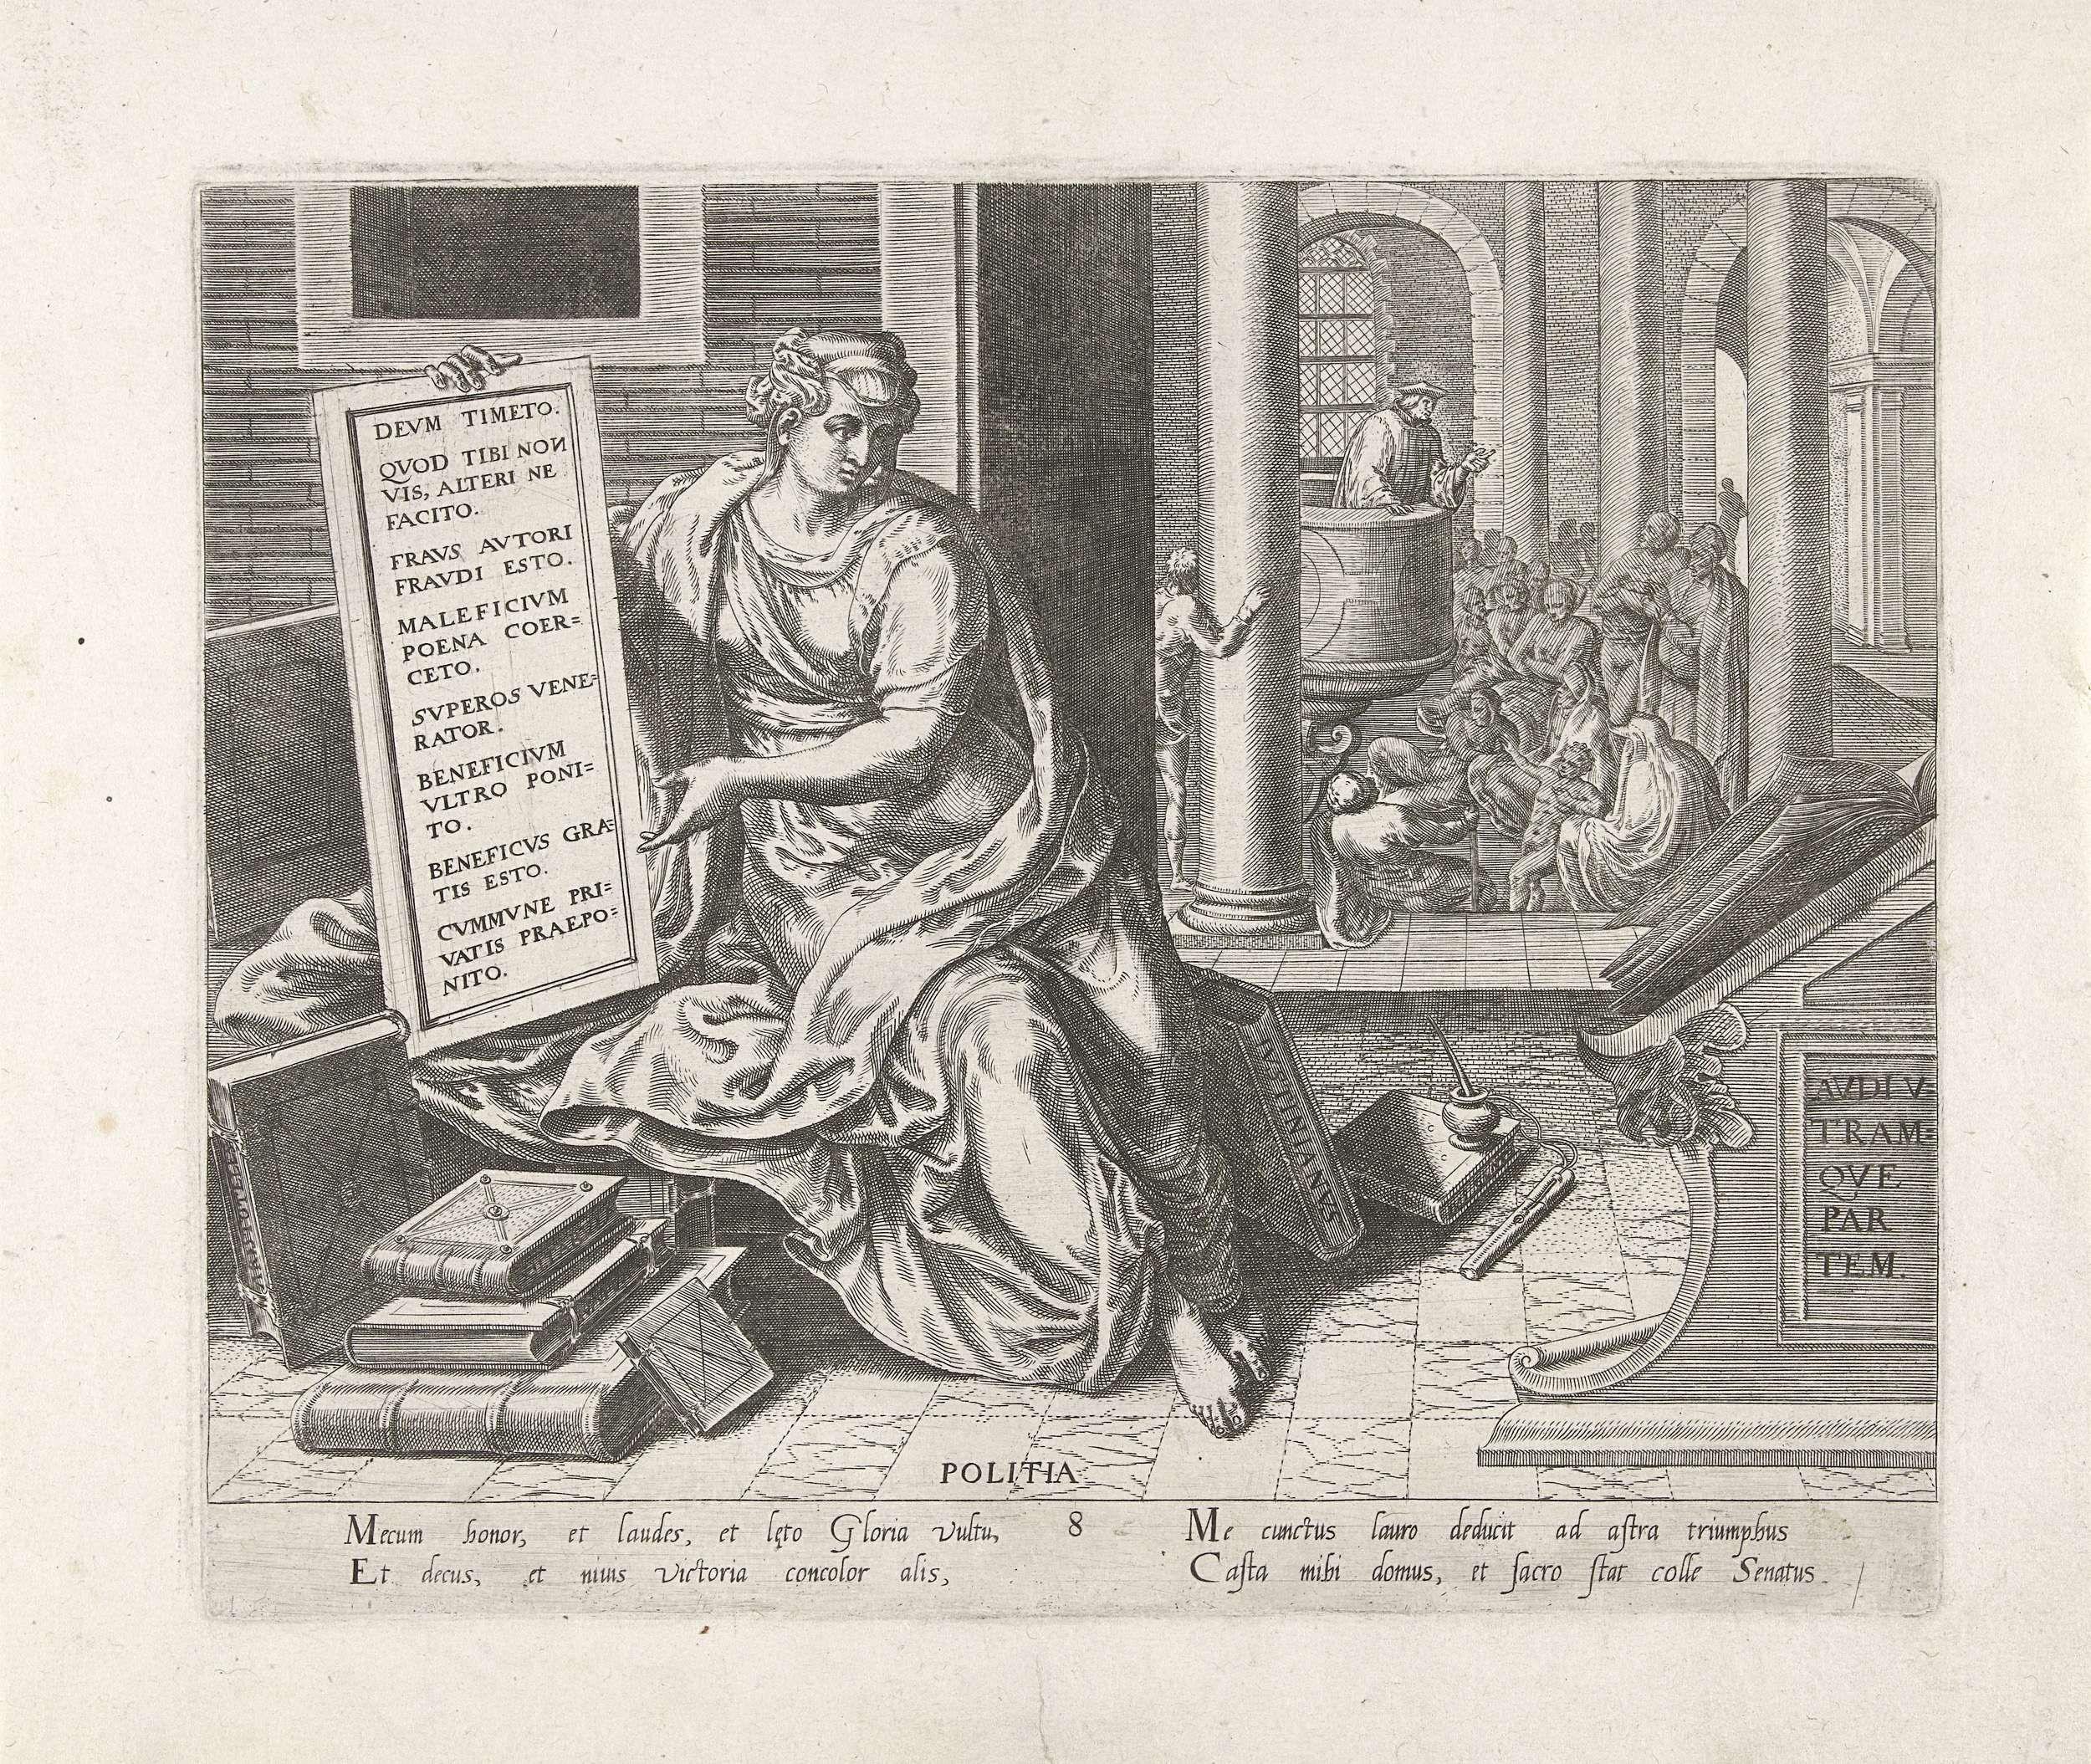 Staatskunde, Philips Galle, Hugo Favolius, 1574 - 1575